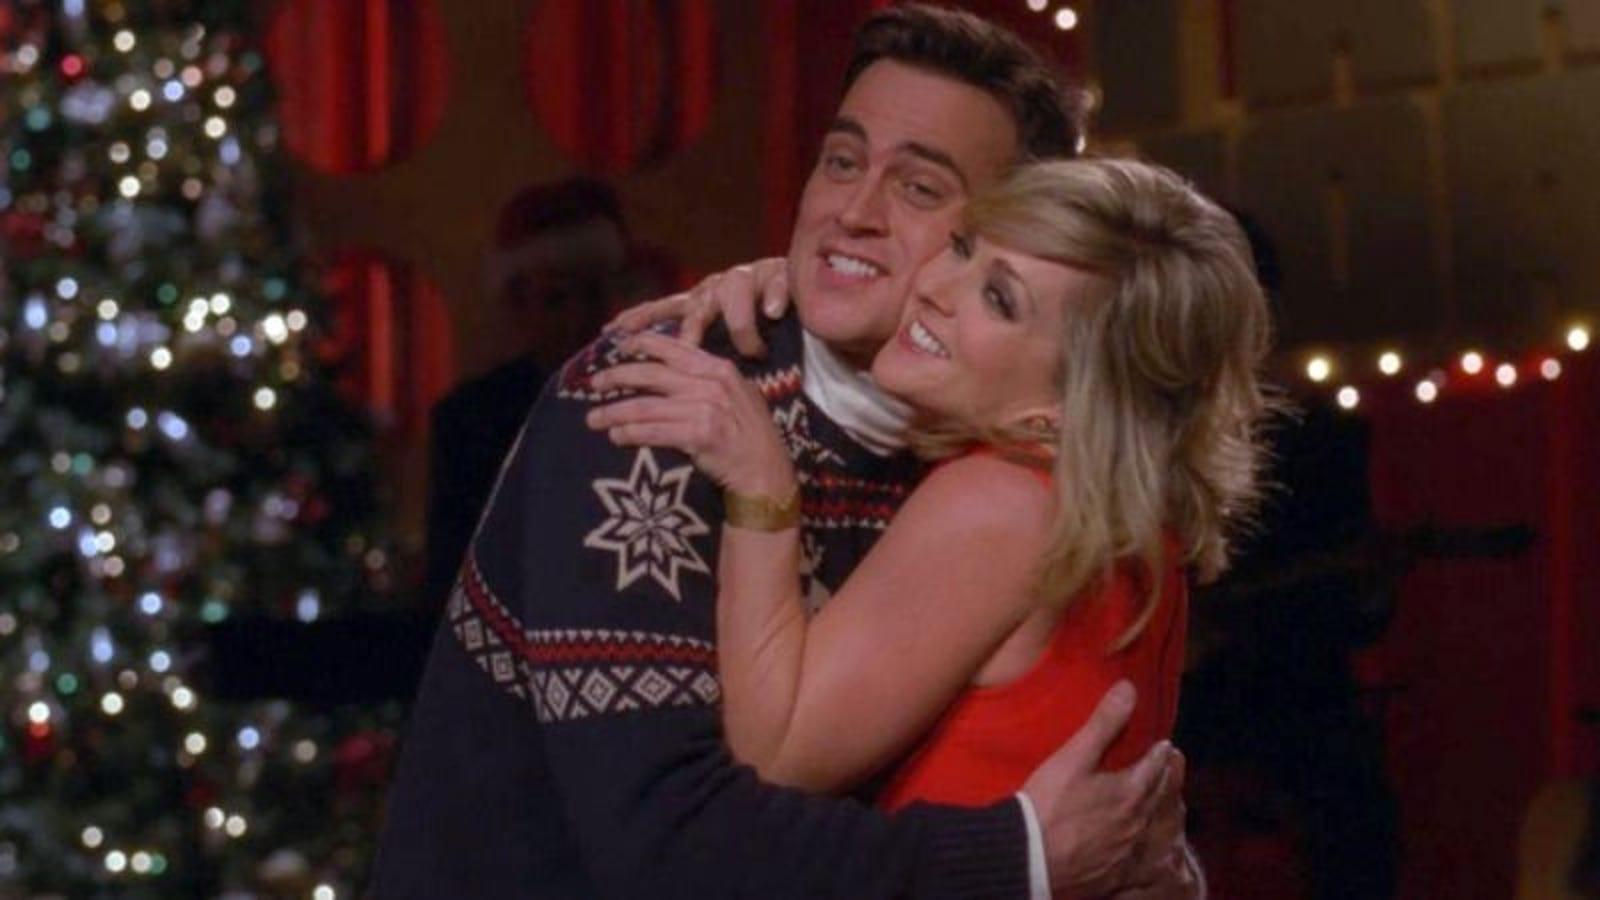 30 Rock Christmas episodes